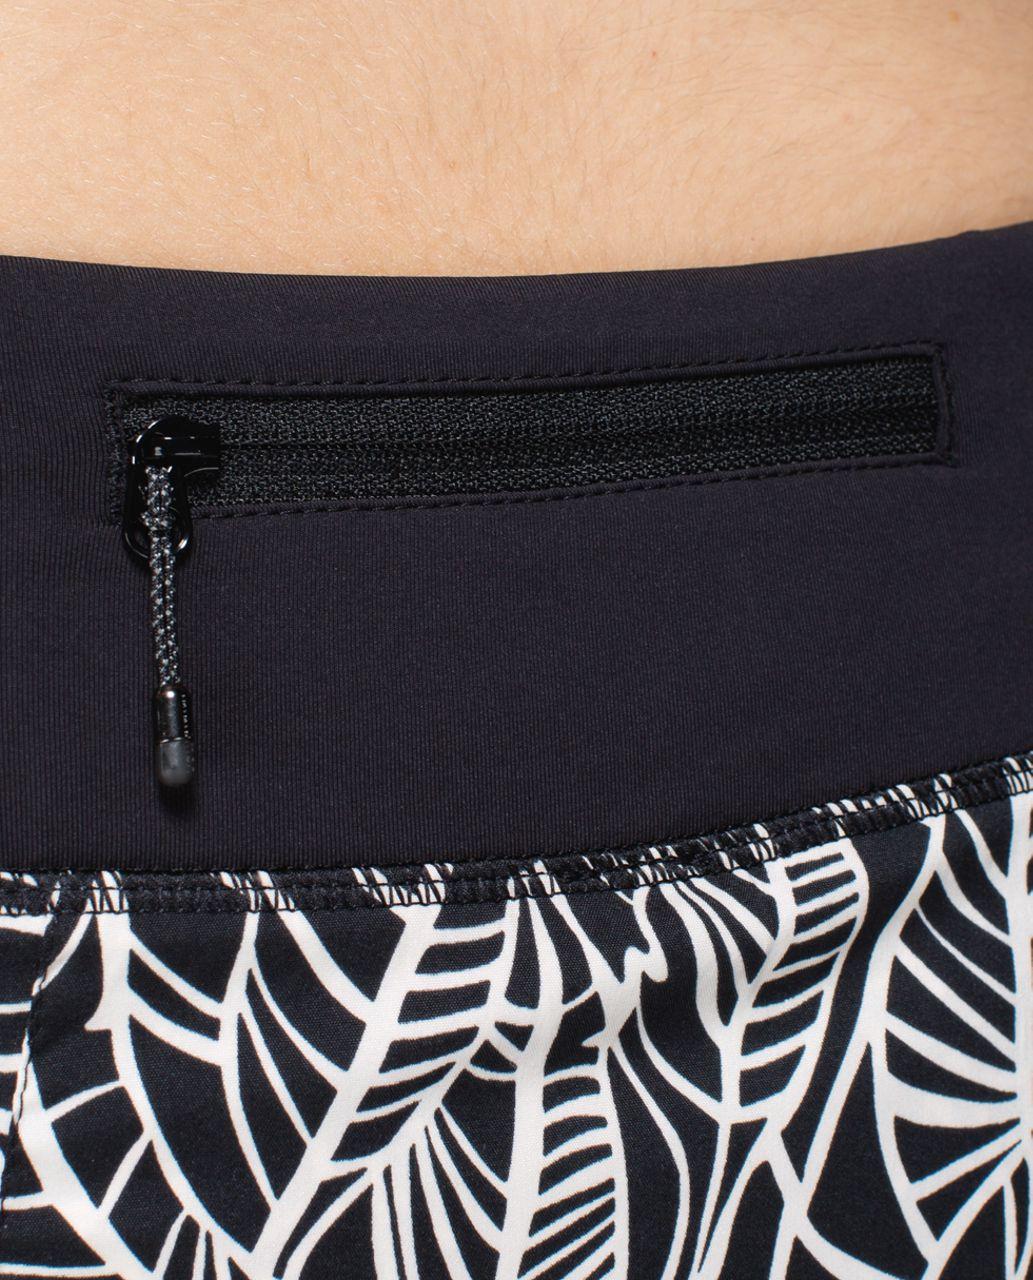 Lululemon Pace Rival Skirt *2-way Stretch (Regular) - Pretty Palm Black Angel Wing / Black